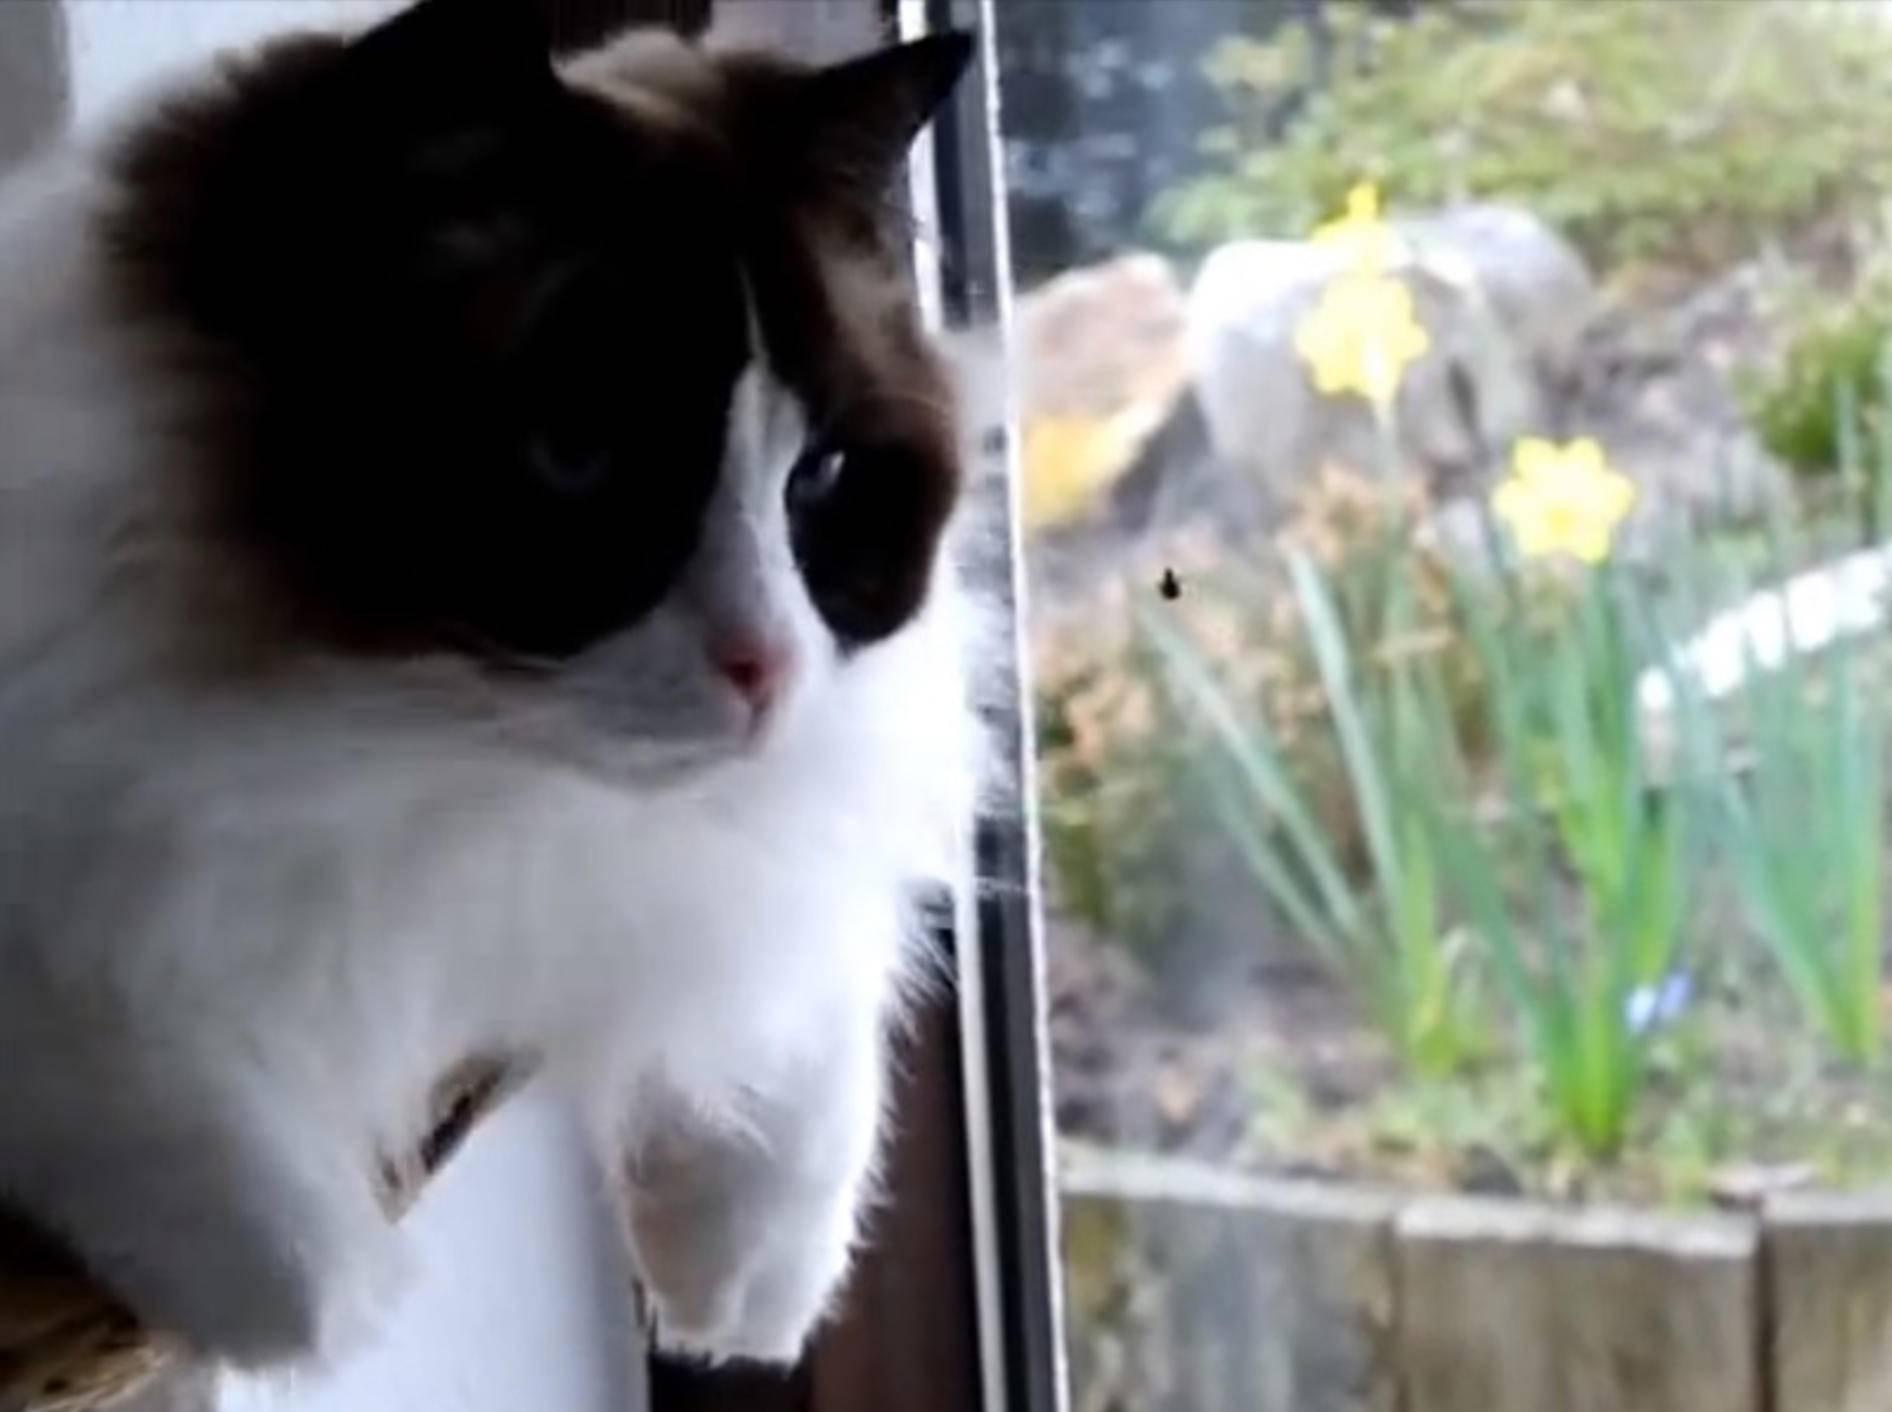 Ragdoll-Kater Timo auf Insektenjagd – Bild: Youtube / Xiedubbel